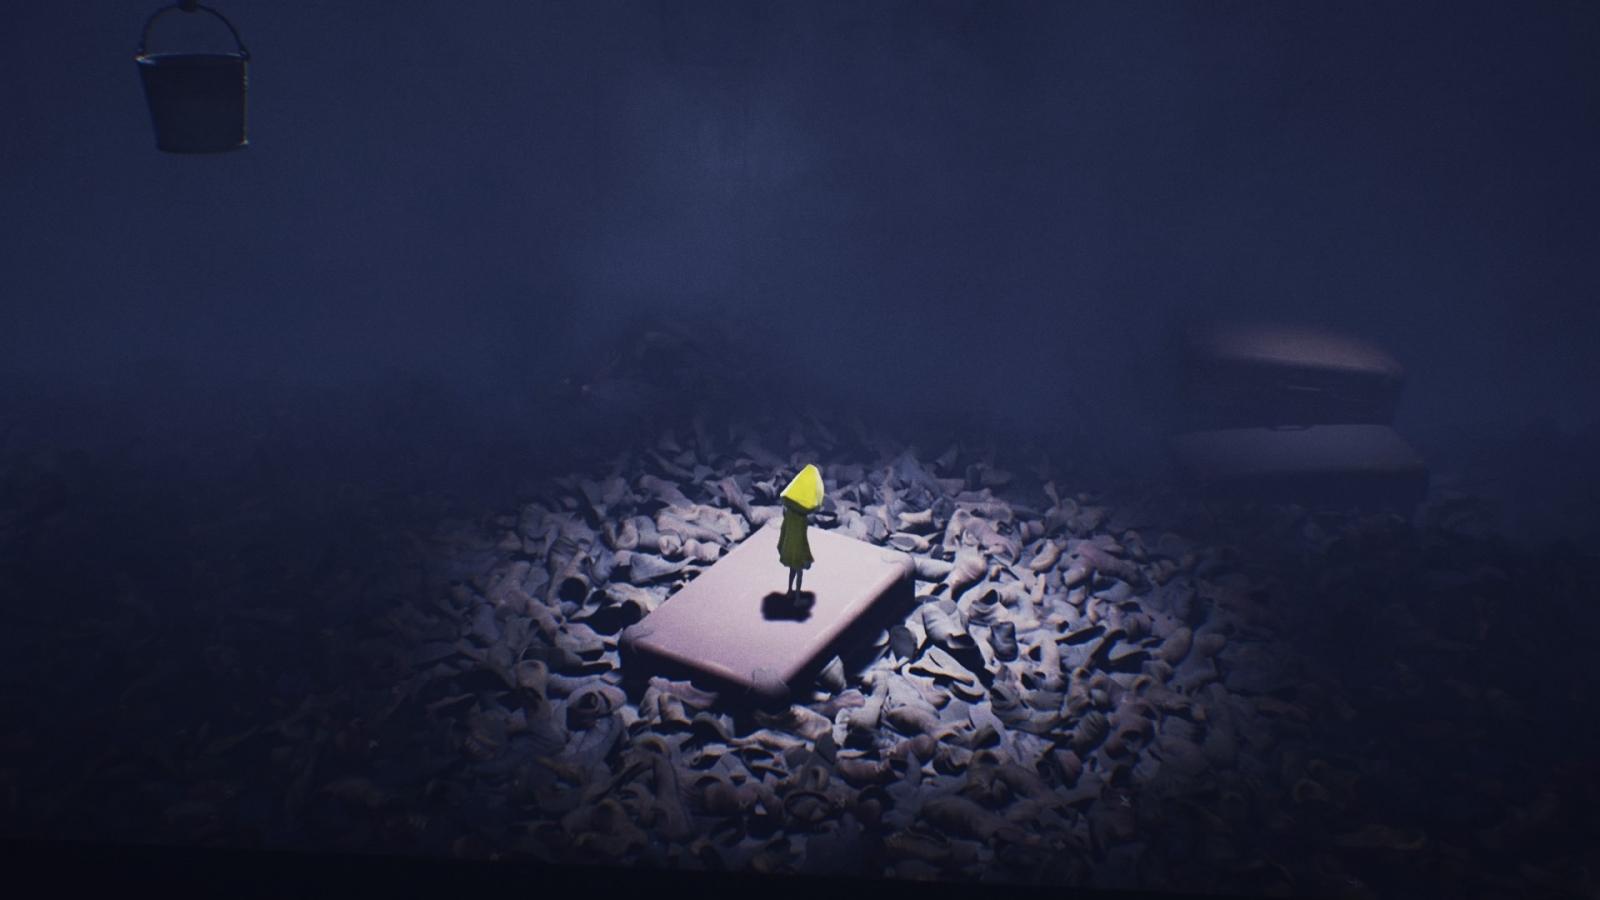 Scary Little Girl Wallpaper Little Nightmares Review Tarsier Studios Grimm Fairy